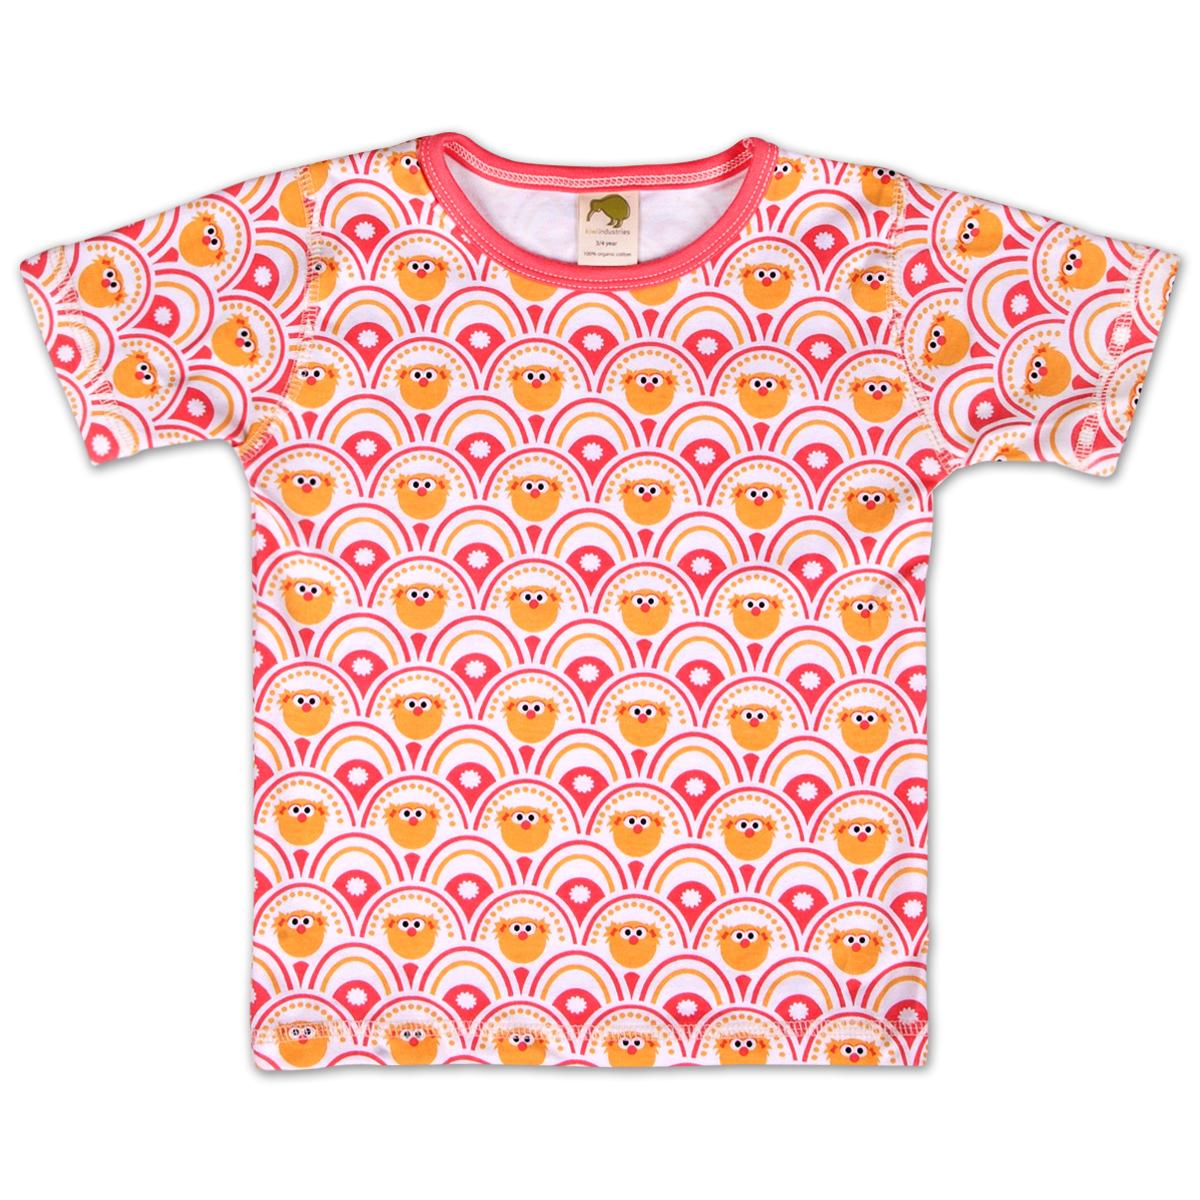 Zoe Blossoms Toddler T-shirt